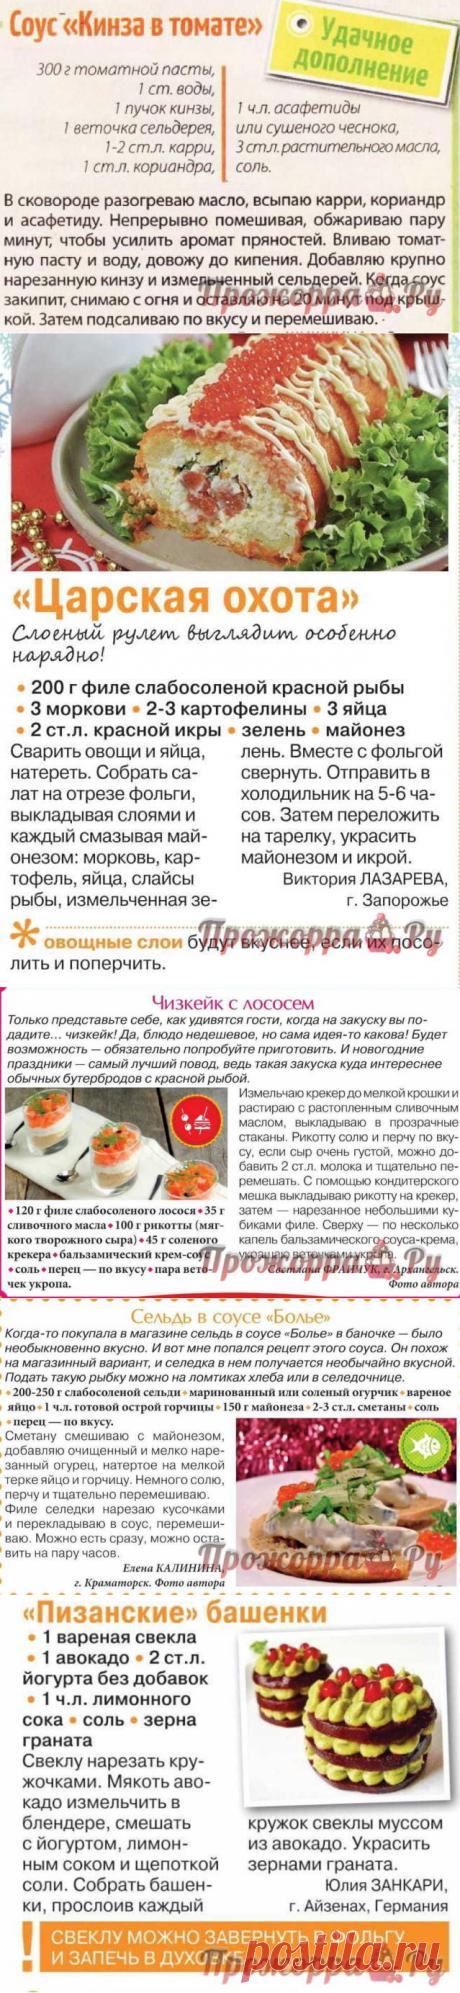 Закуски 2 | Прожоpра.РуПрожоpра.Ру